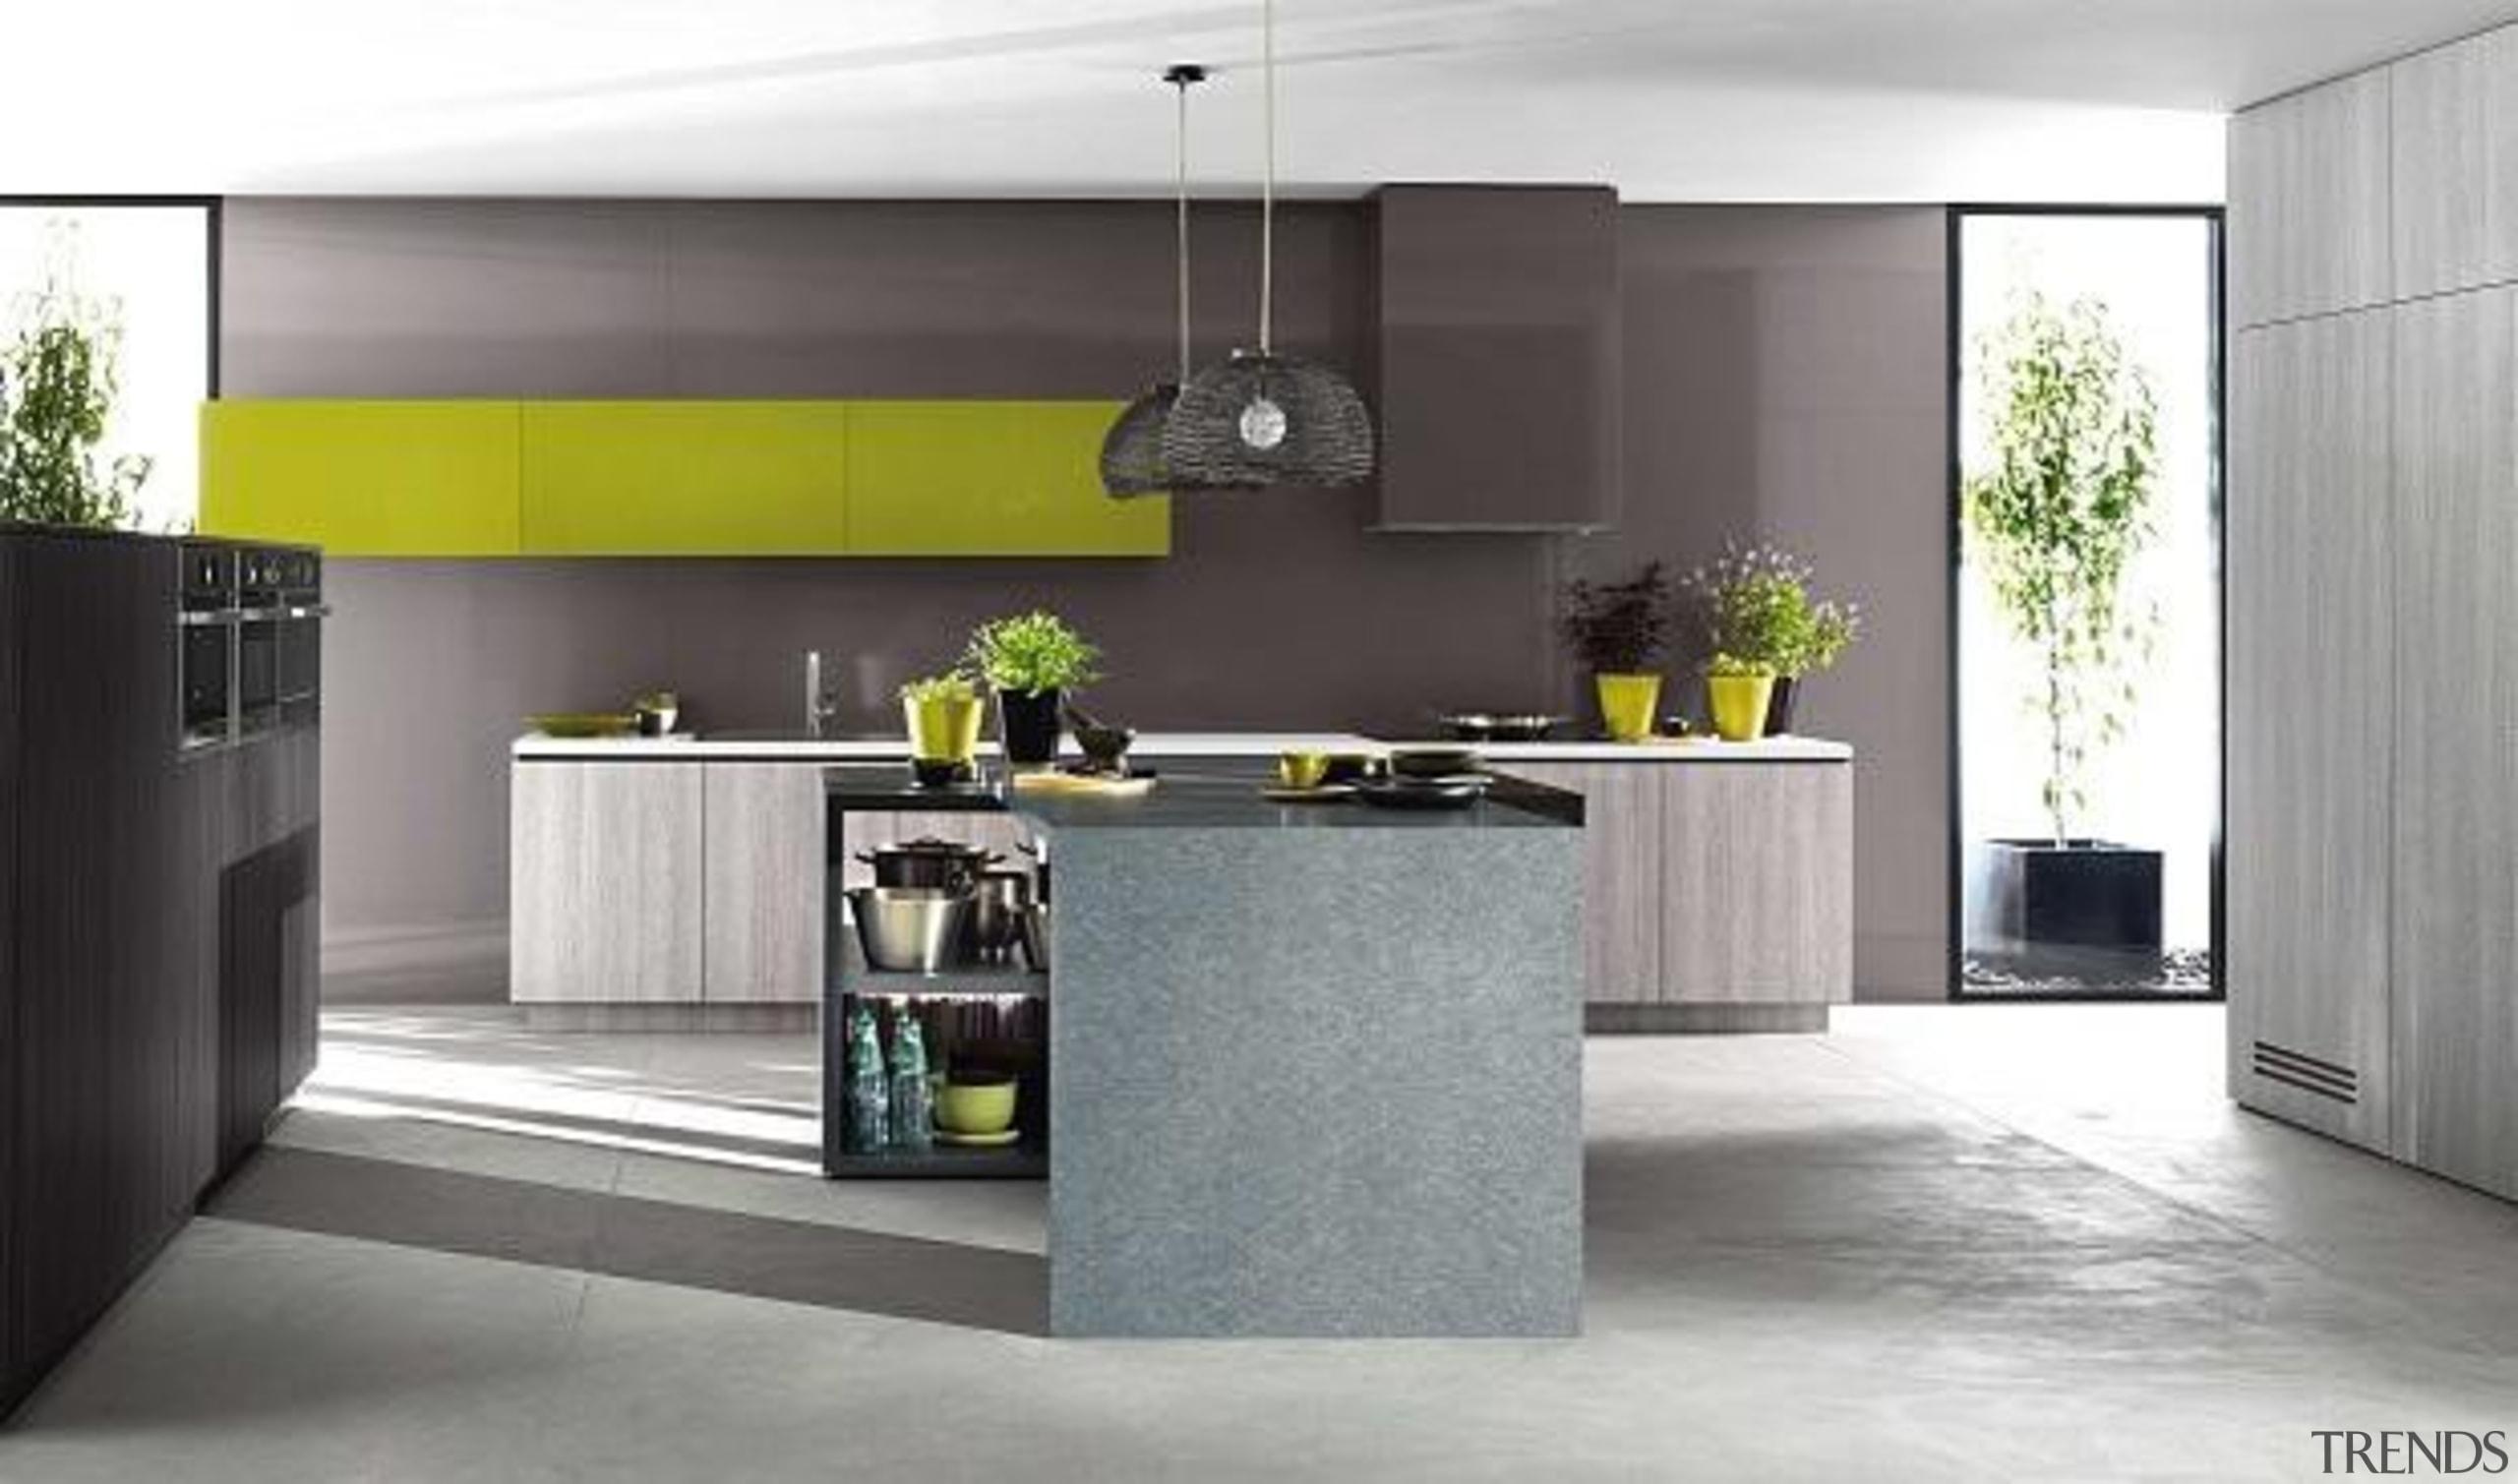 Featuring: Laminex HPL Bleached Wenge, Laminex Squareform Fresh countertop, cuisine classique, floor, interior design, kitchen, product design, gray, white